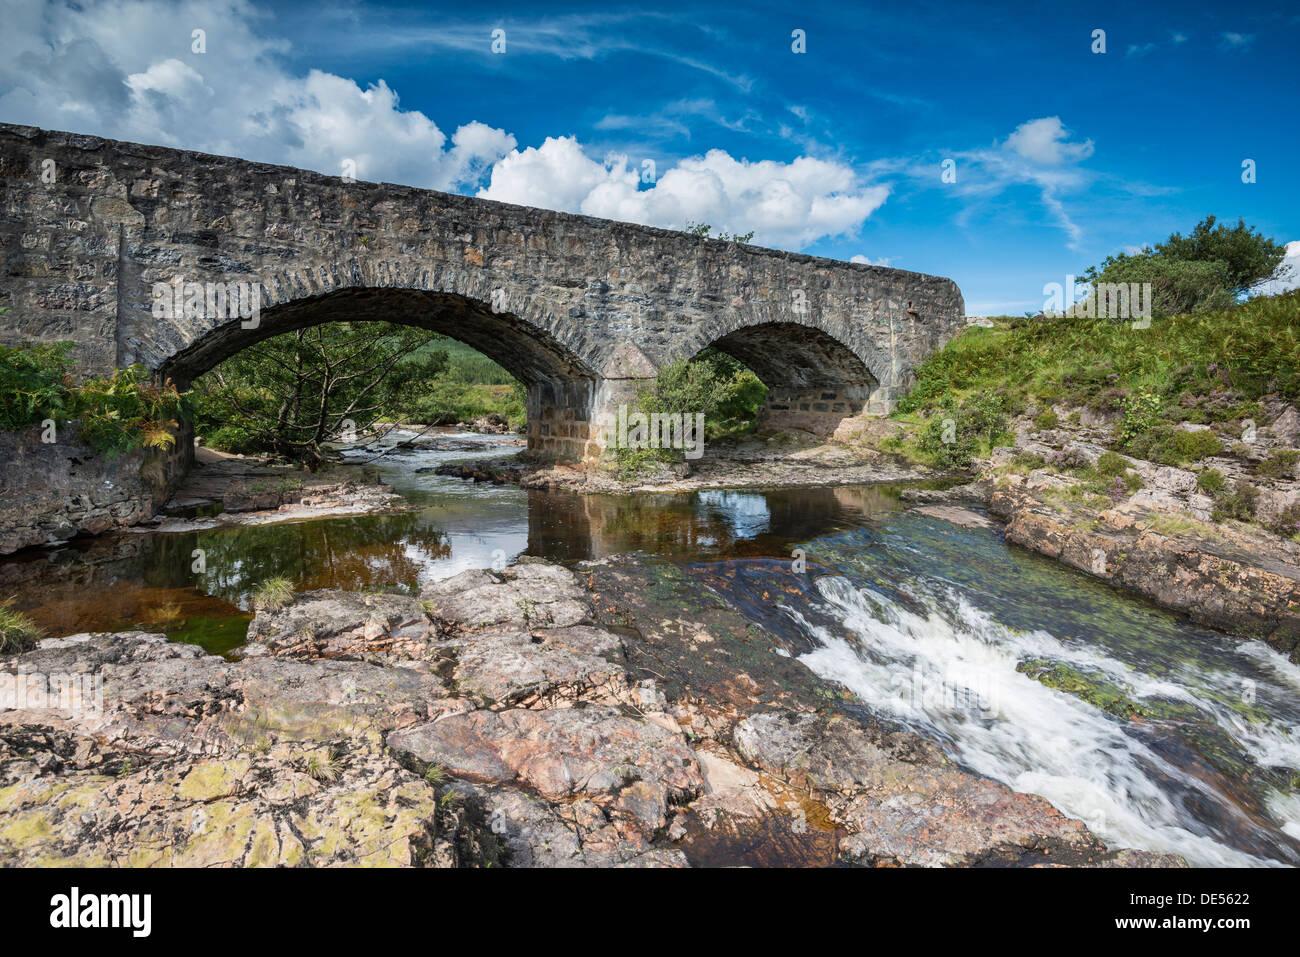 Old stone bridge across the Strath Beag River, Polla, Northern Highlands, Scotland, United Kingdom - Stock Image